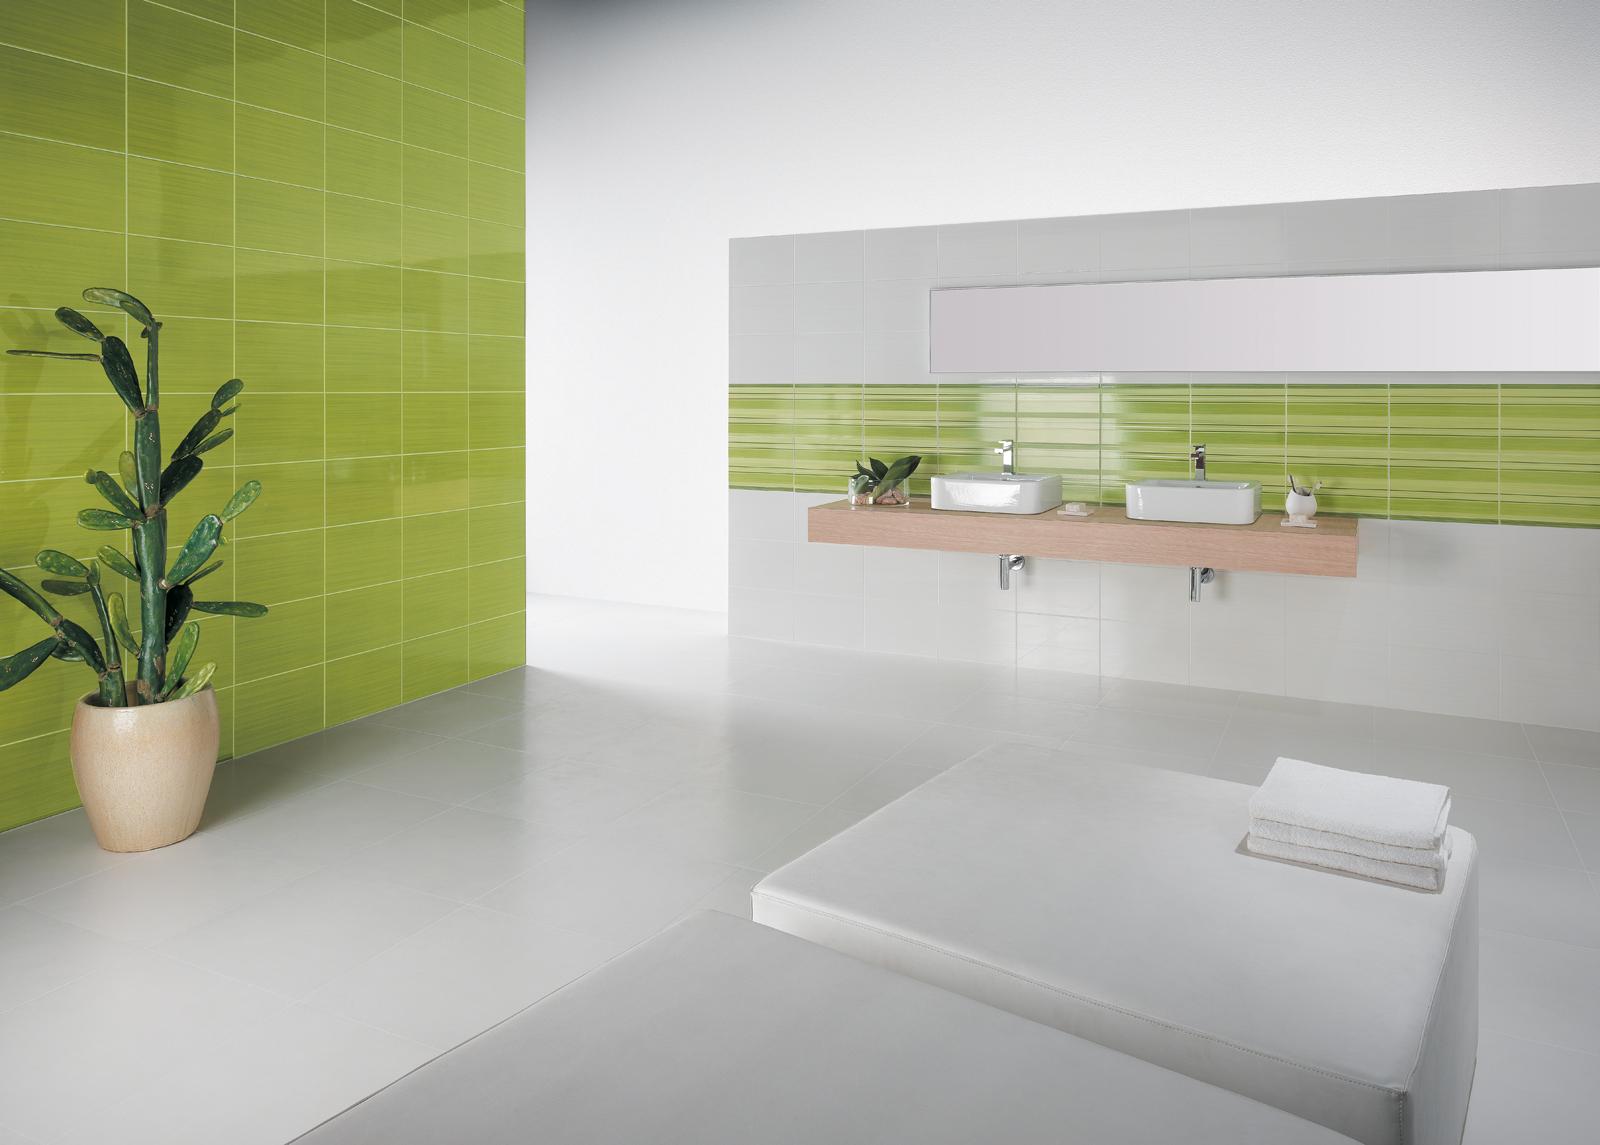 Vertical rivestimenti residenziali marazzi - Piastrelle bagno verdi ...